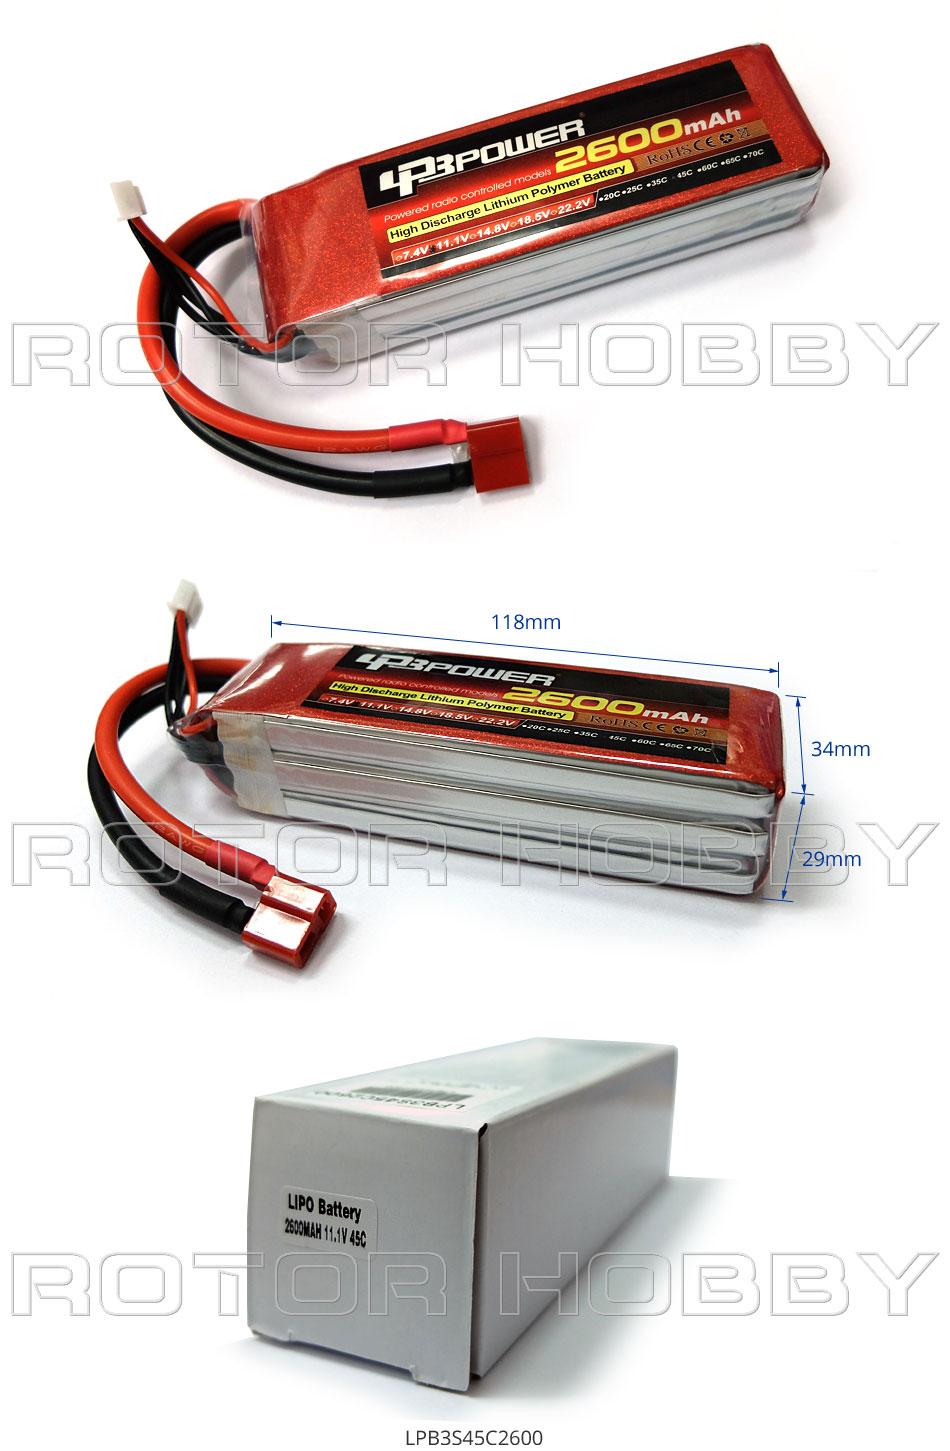 11.1V 2600mAh 45C LiPo Battery, T plug